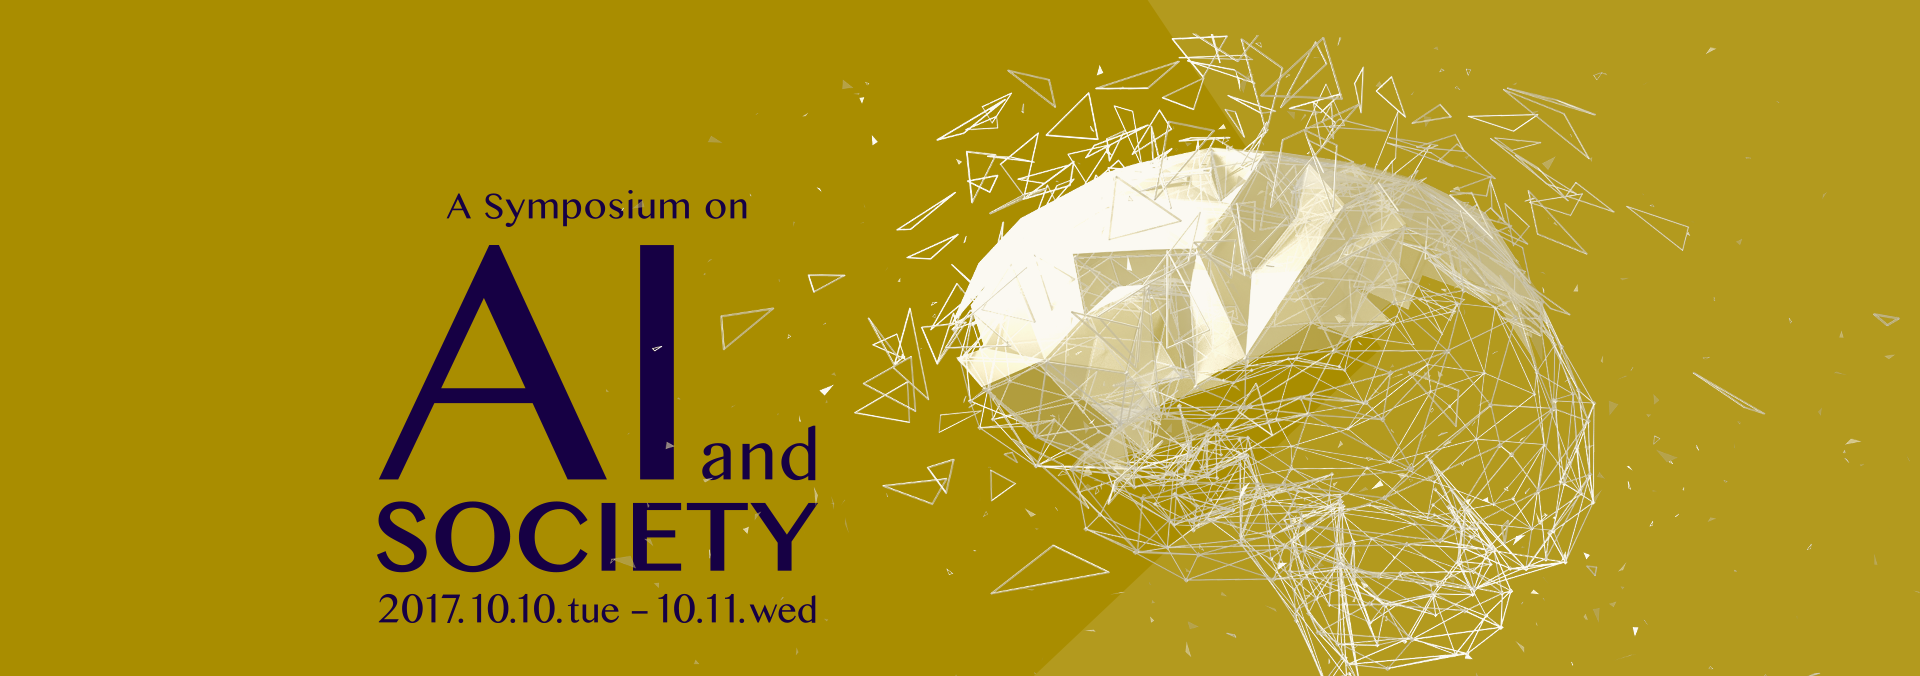 AIandSociety Symposium